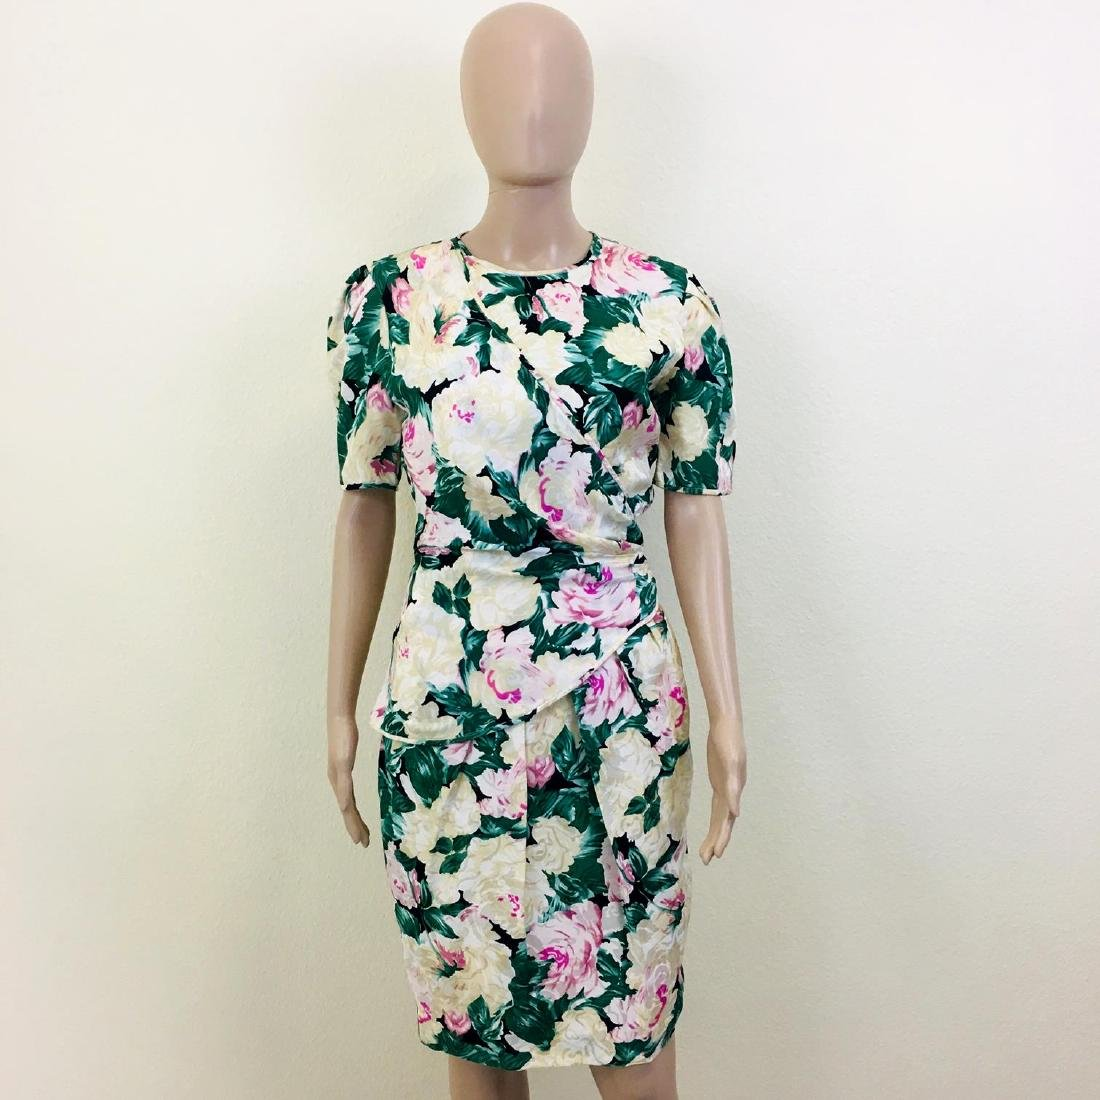 Vintage Women's Maggy London 100% Silk Dress - 2